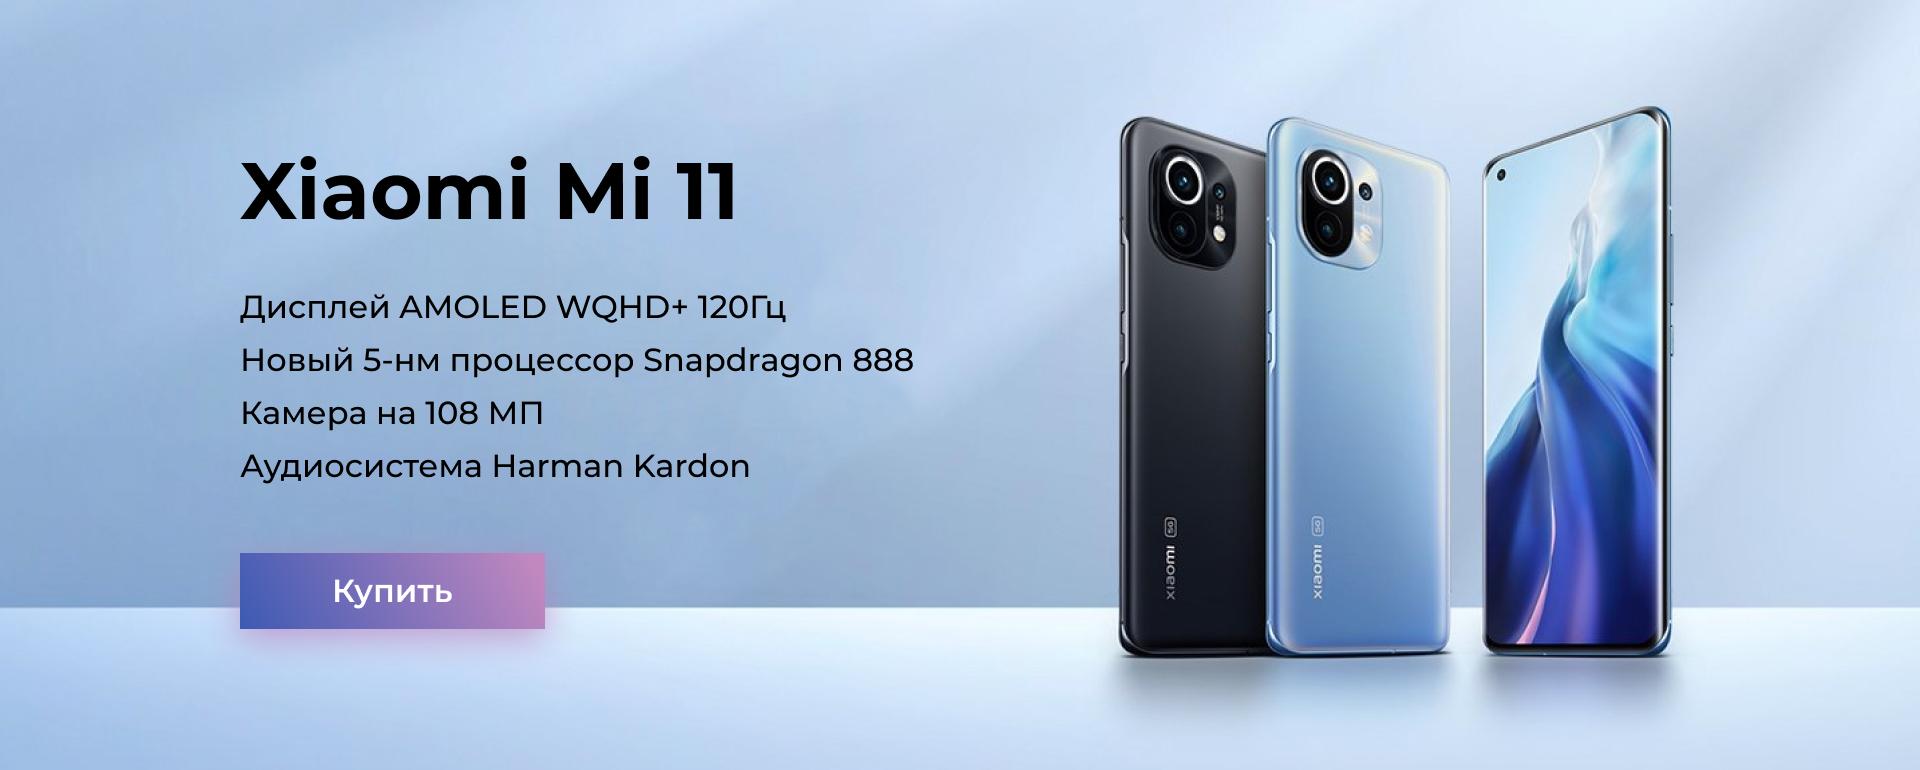 Xiaomi Mi 11 купить